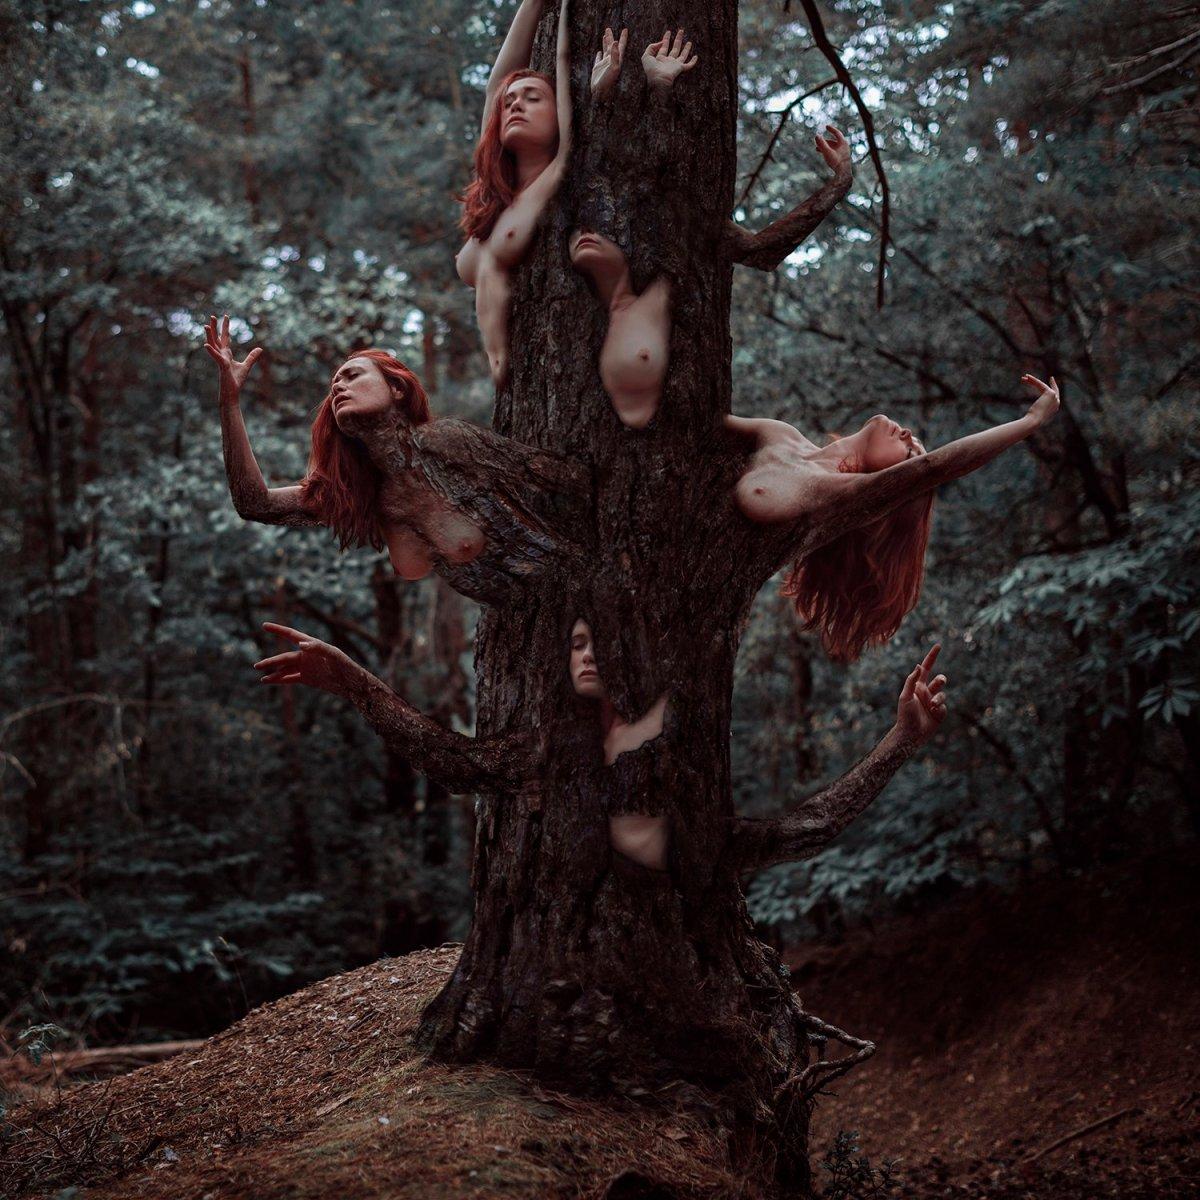 Otherworldly Imagery Of Frank Diamond surreal photography Metamorfosis